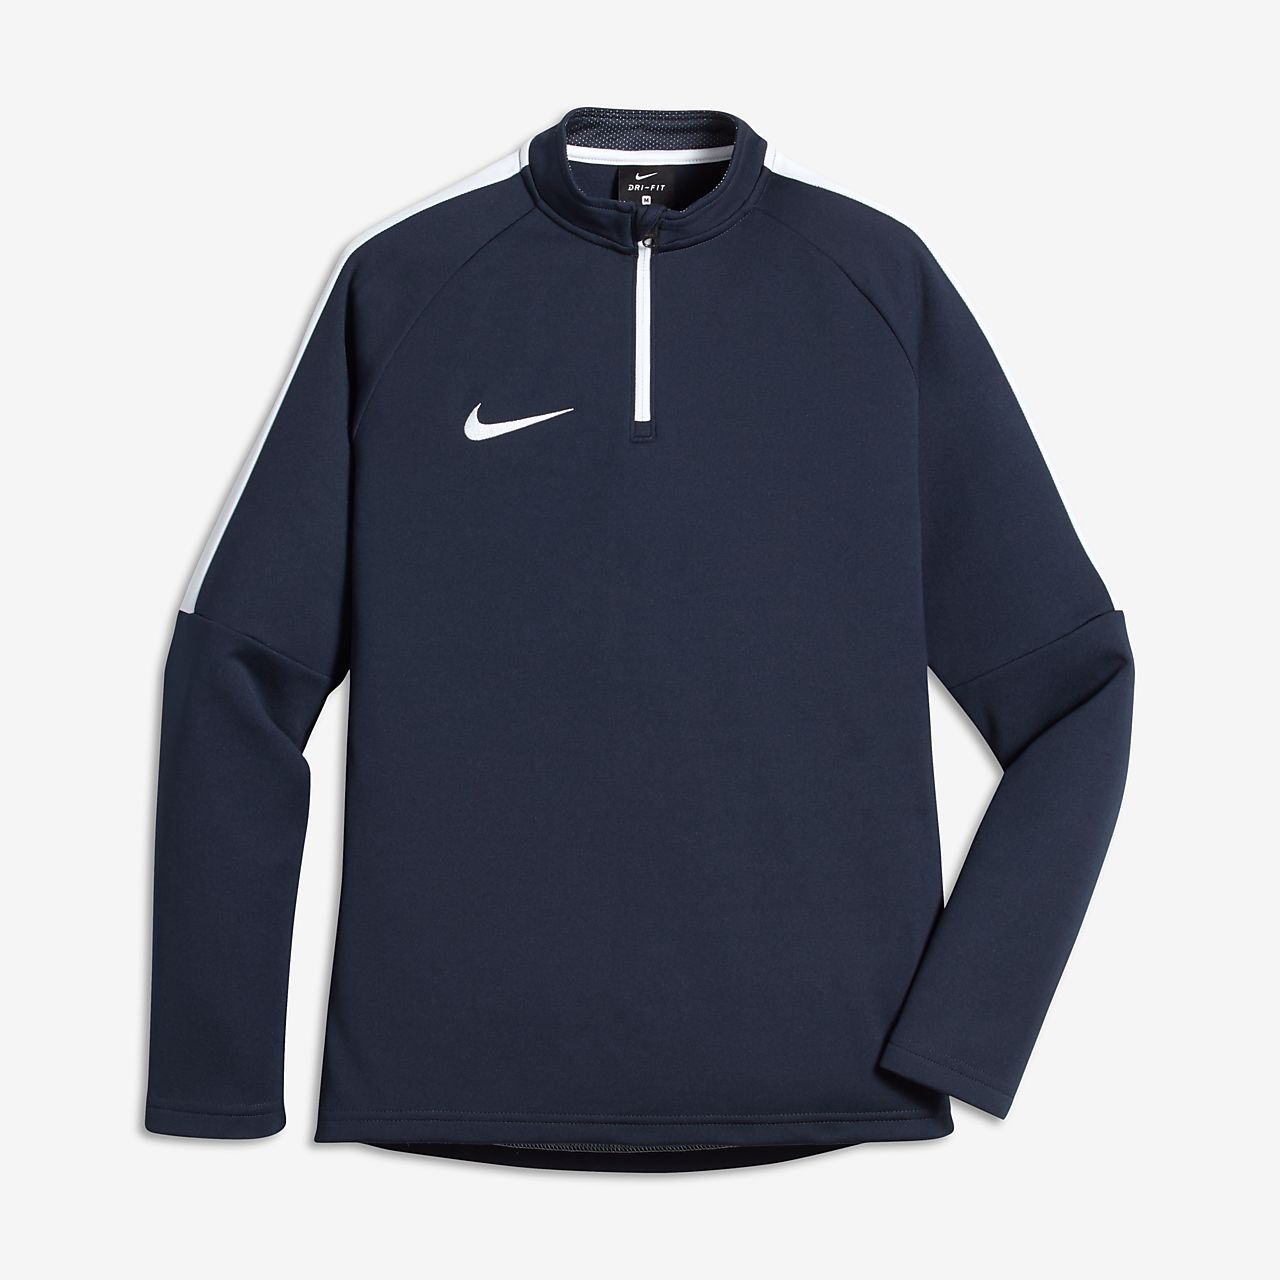 Nike Dri-FIT Camiseta de fútbol de entrenamiento - Niño a. Nike.com ES 282459a17b140